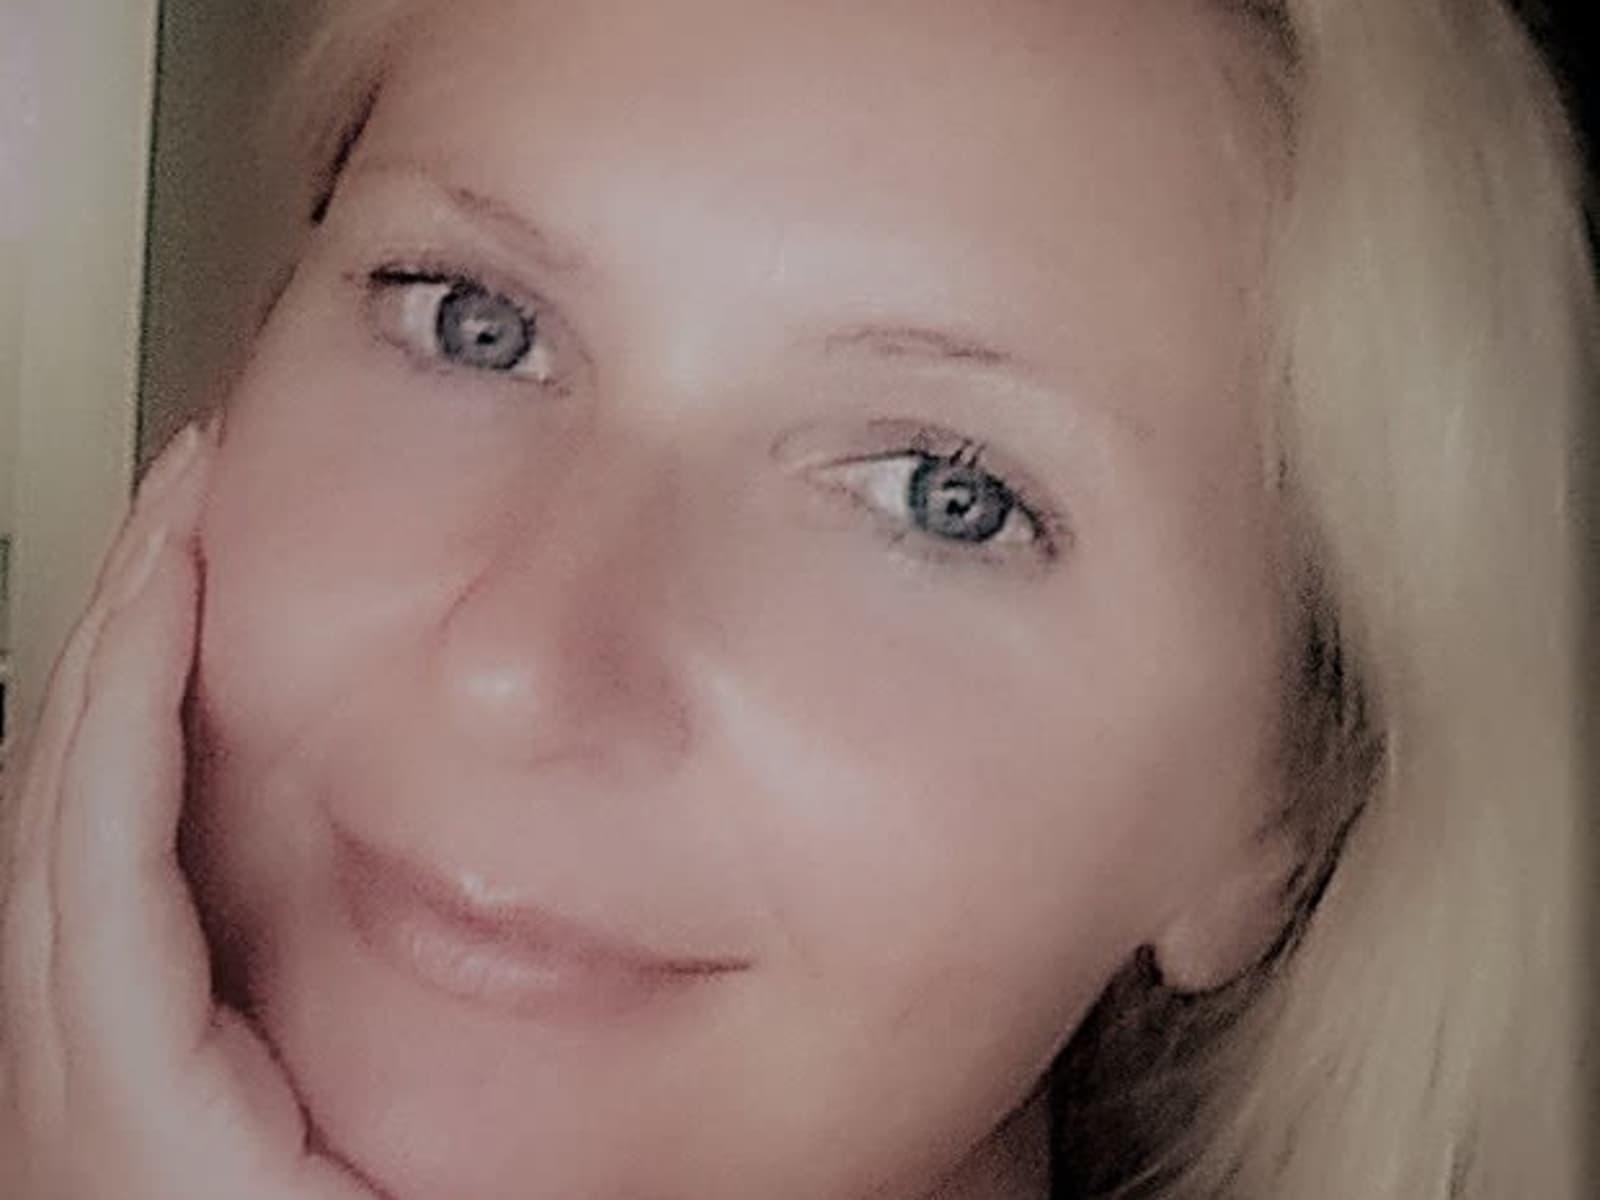 Sharon from Sittingbourne, United Kingdom